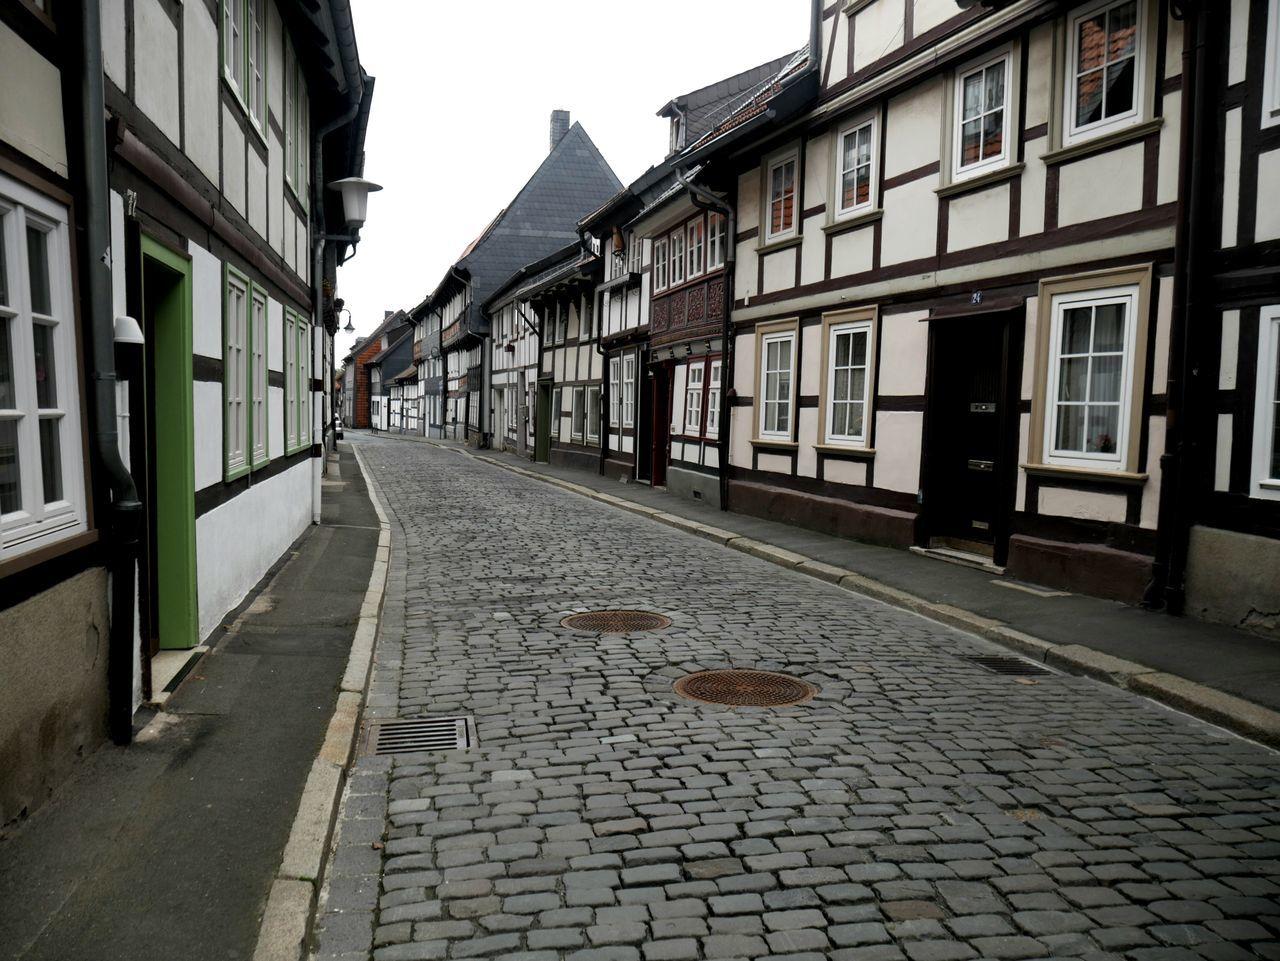 Goslar Fachwerk Fachwerkhaus History Tradition Street No People Lost